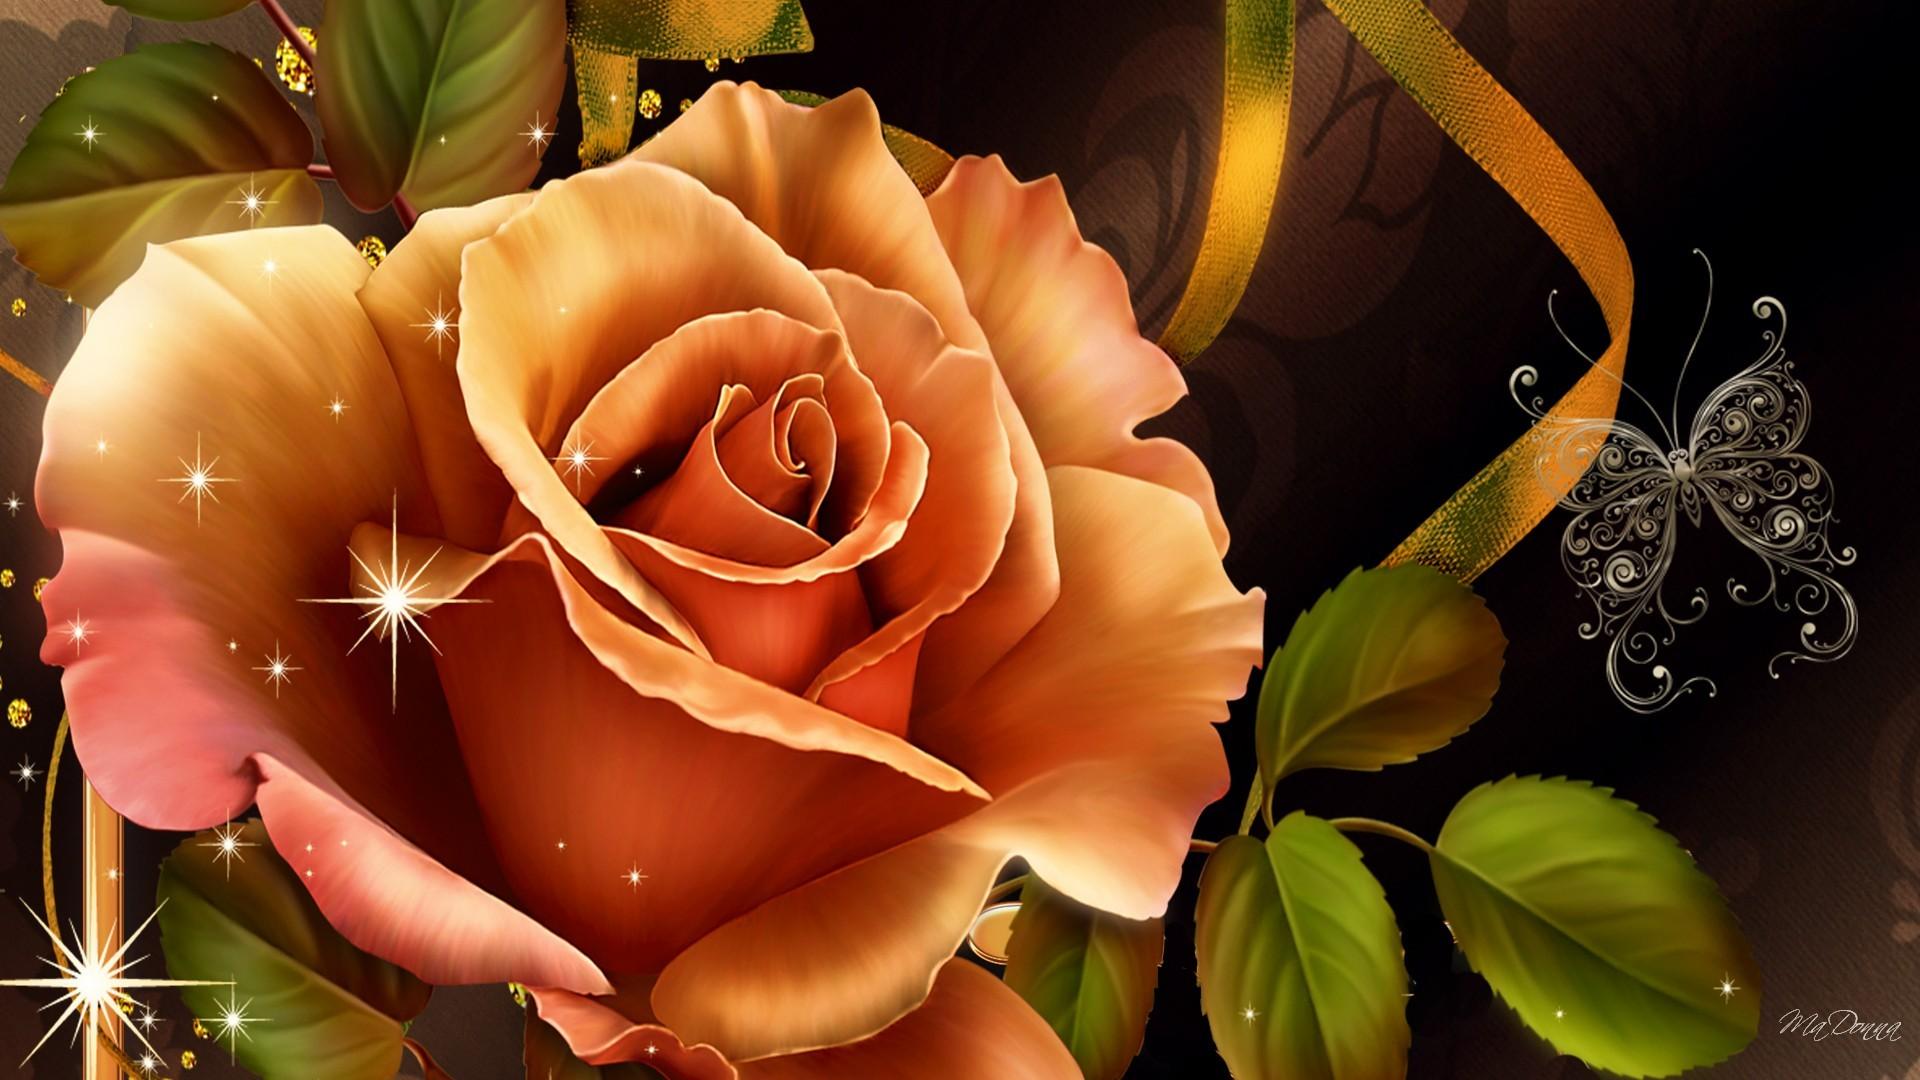 Peach Rose Hd Wallpaper Background Image 1920x1080 Id 779100